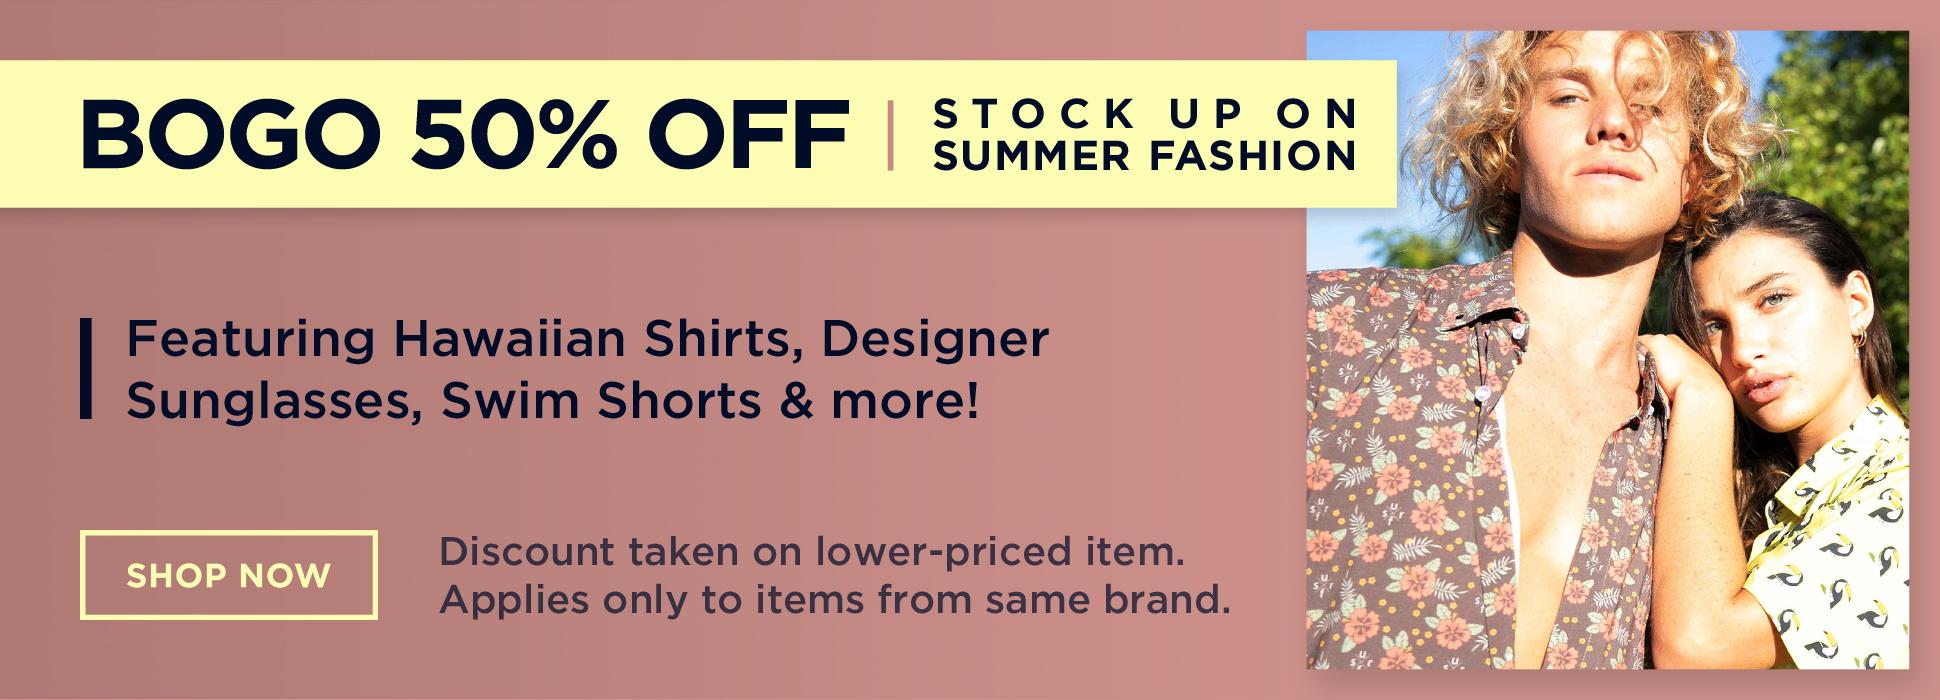 Summer Fashion BOGO (Banners)